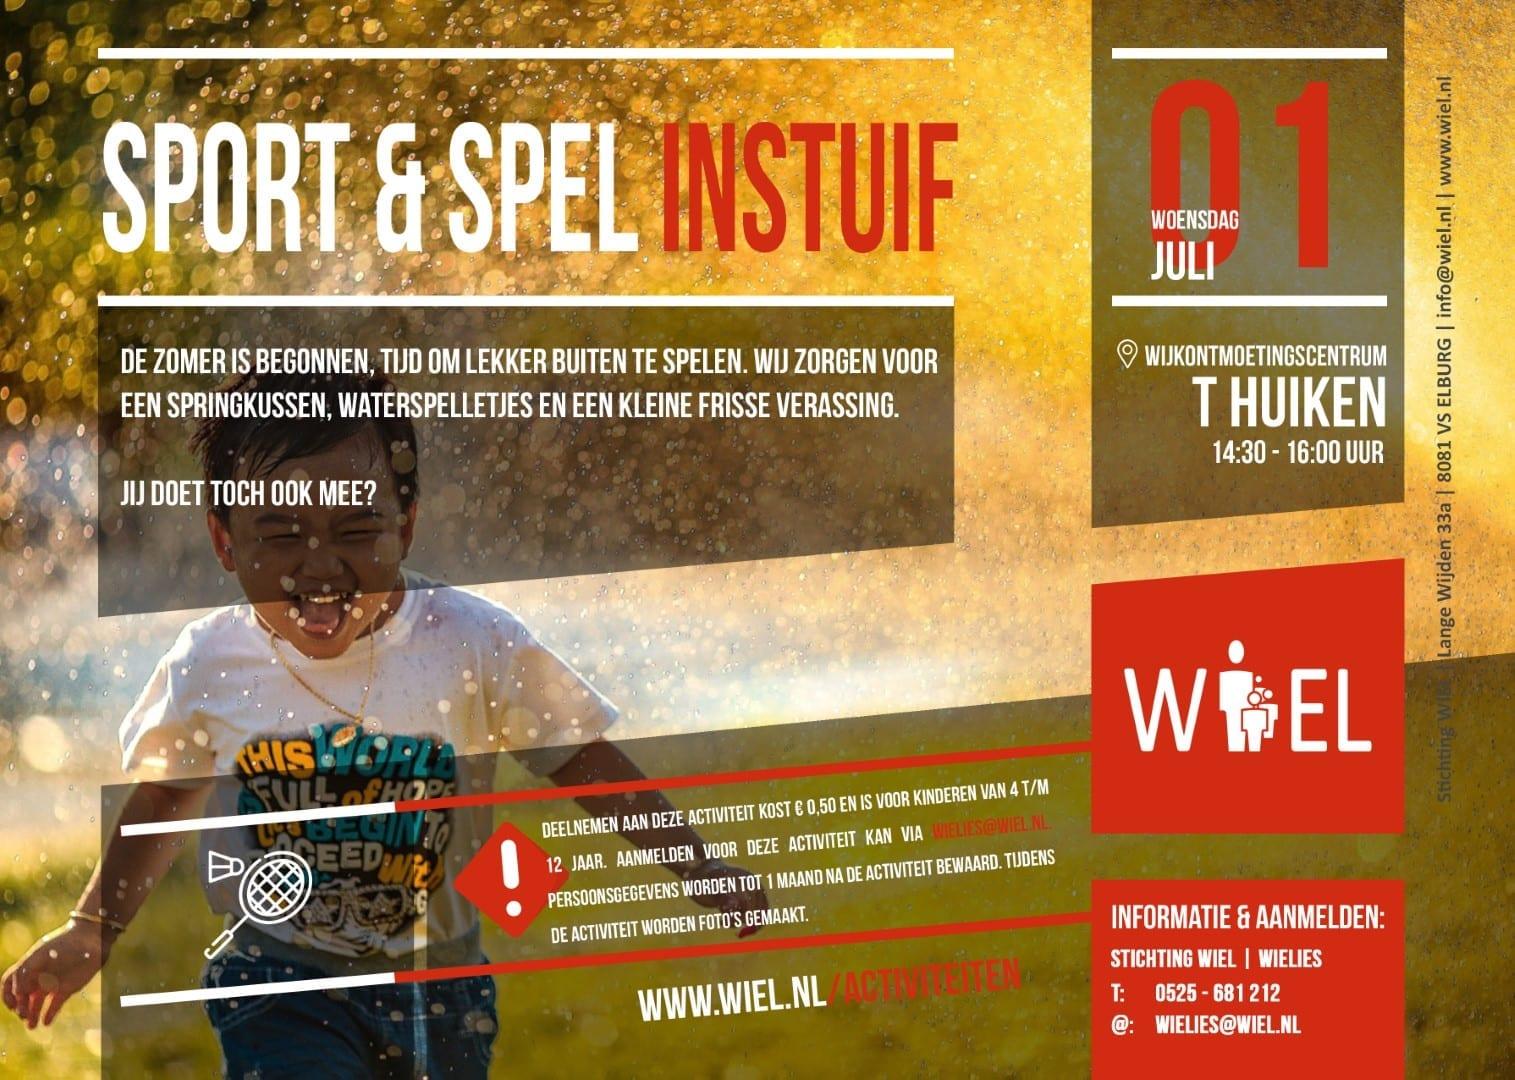 Sport&Spel instuif - Stichting WIEL